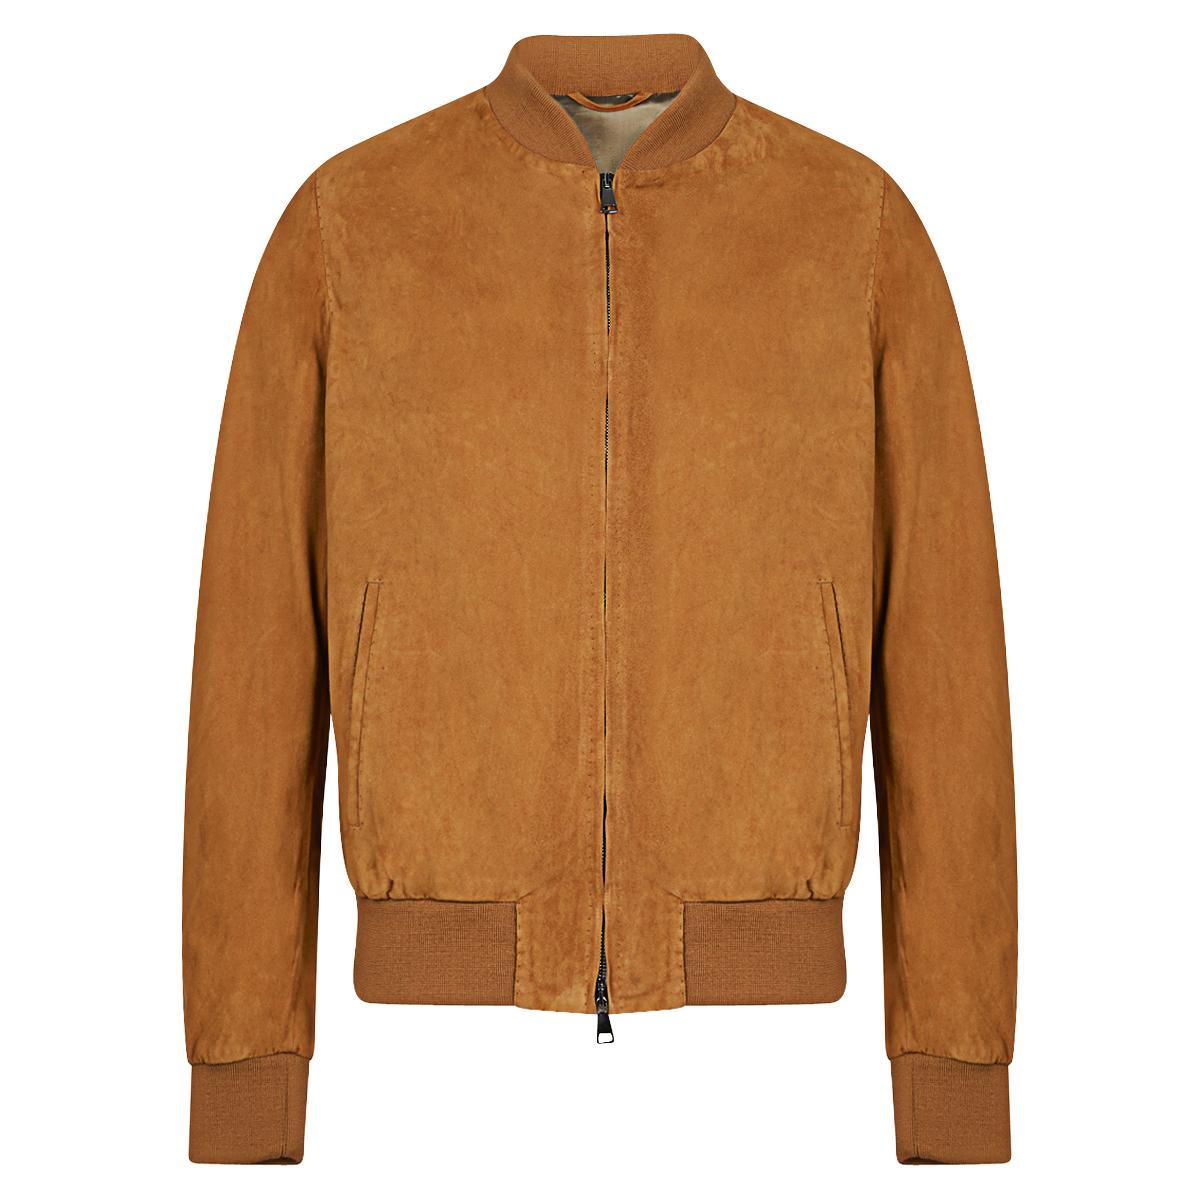 Camel Suede Handmade Classic Bomber Jacket